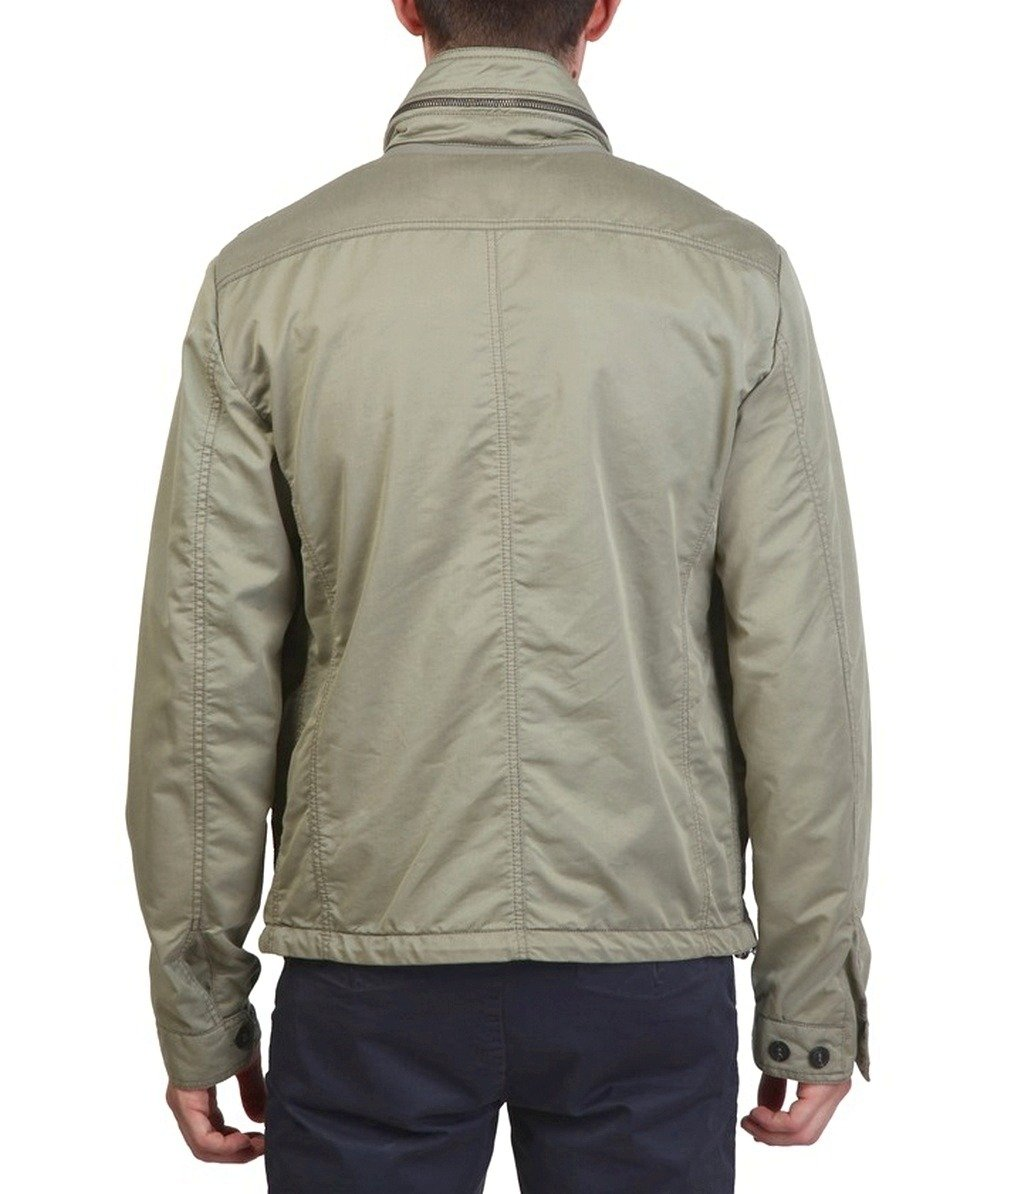 GEOX Respira Herren Men Übergangs Jacke Jacket BeigeGrüntöne